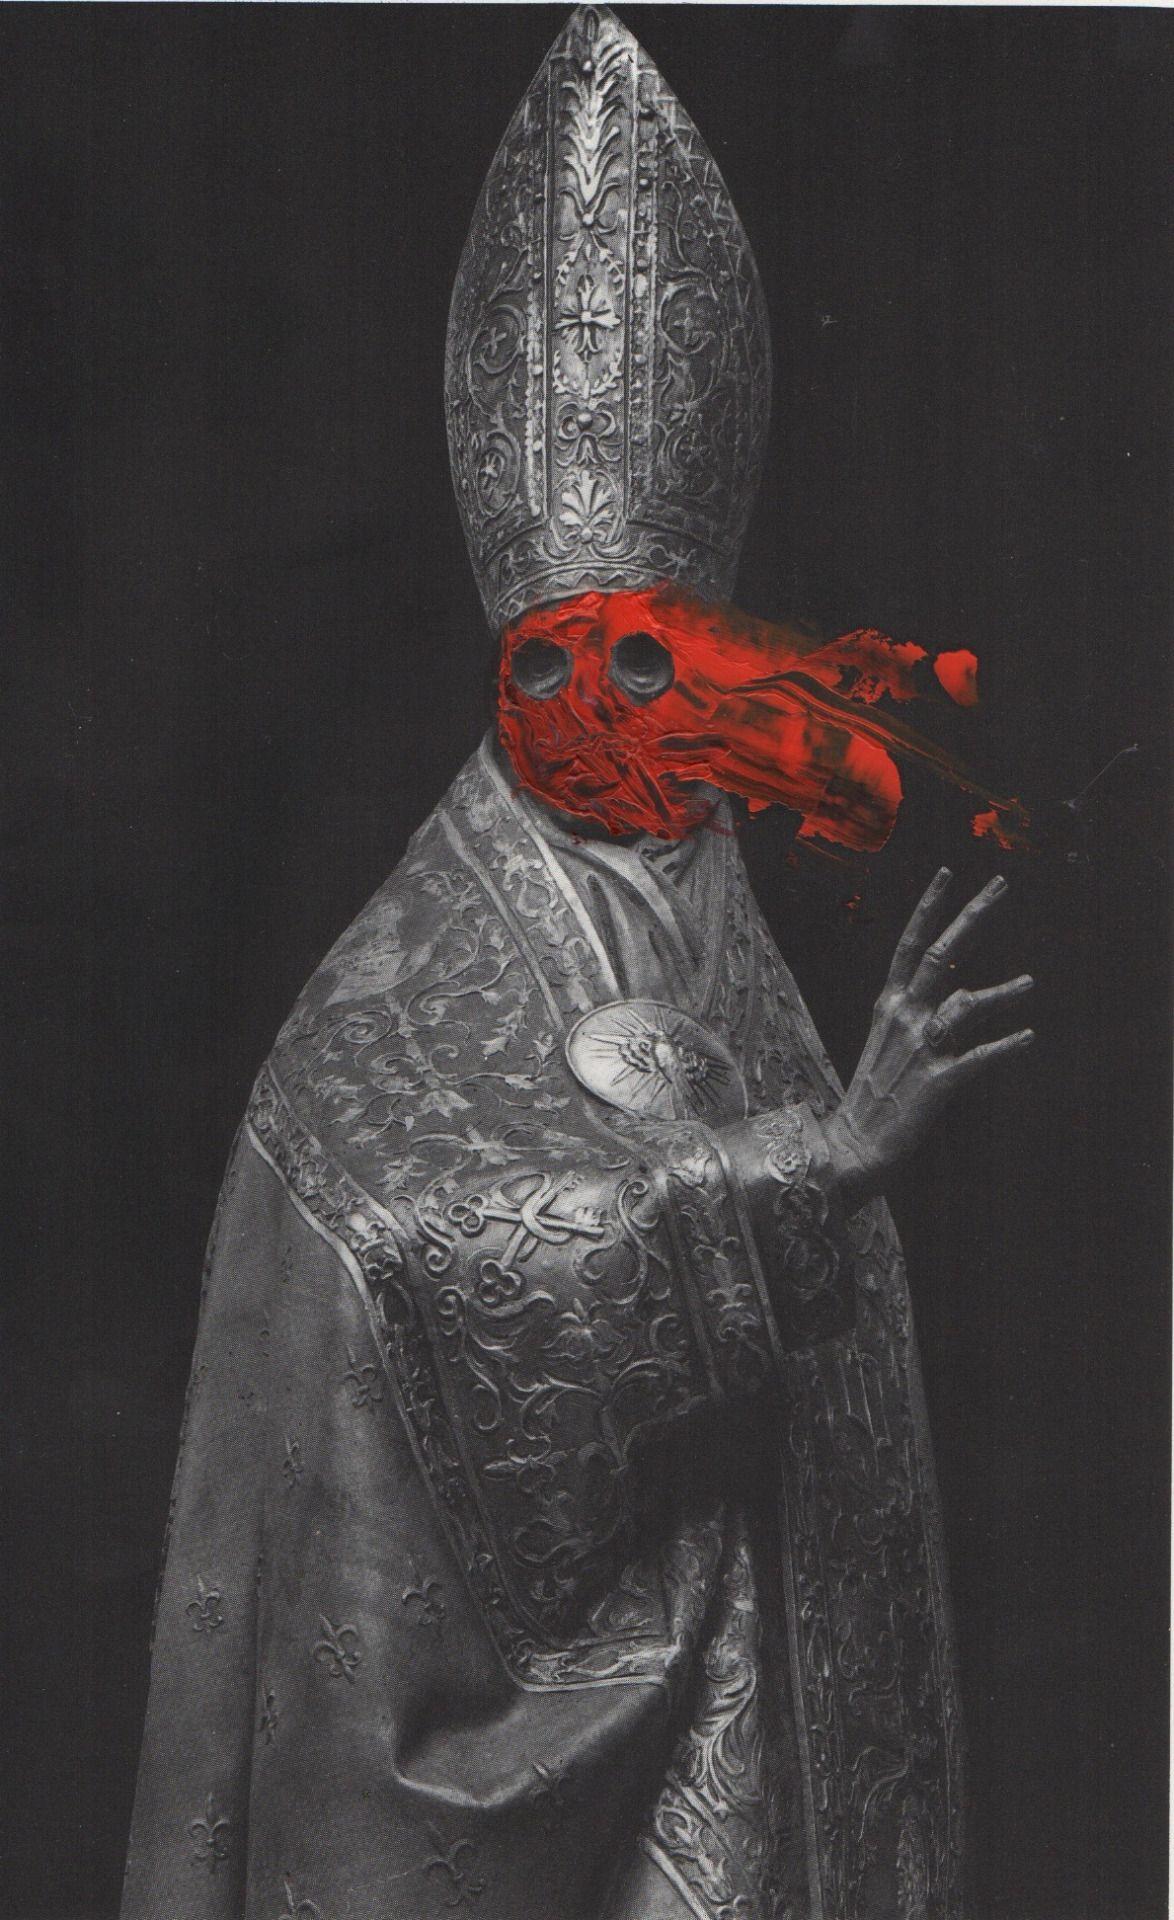 Memento mori (the Grotte Vaticane), Nicholas Ballesteros